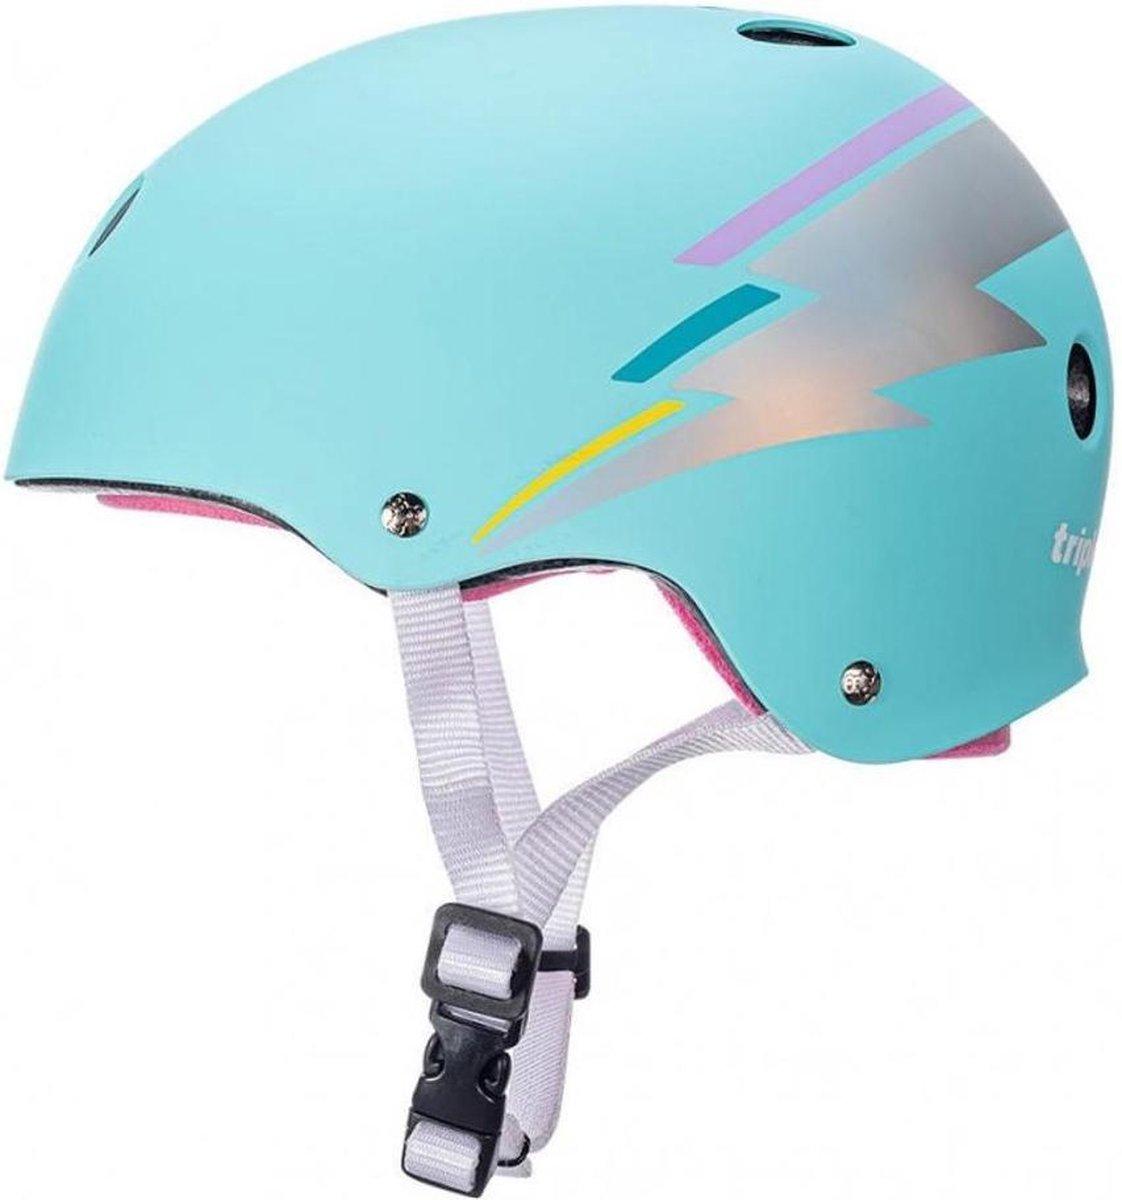 The Certified Sweatsaver Helmet Teal Hologram XS/S